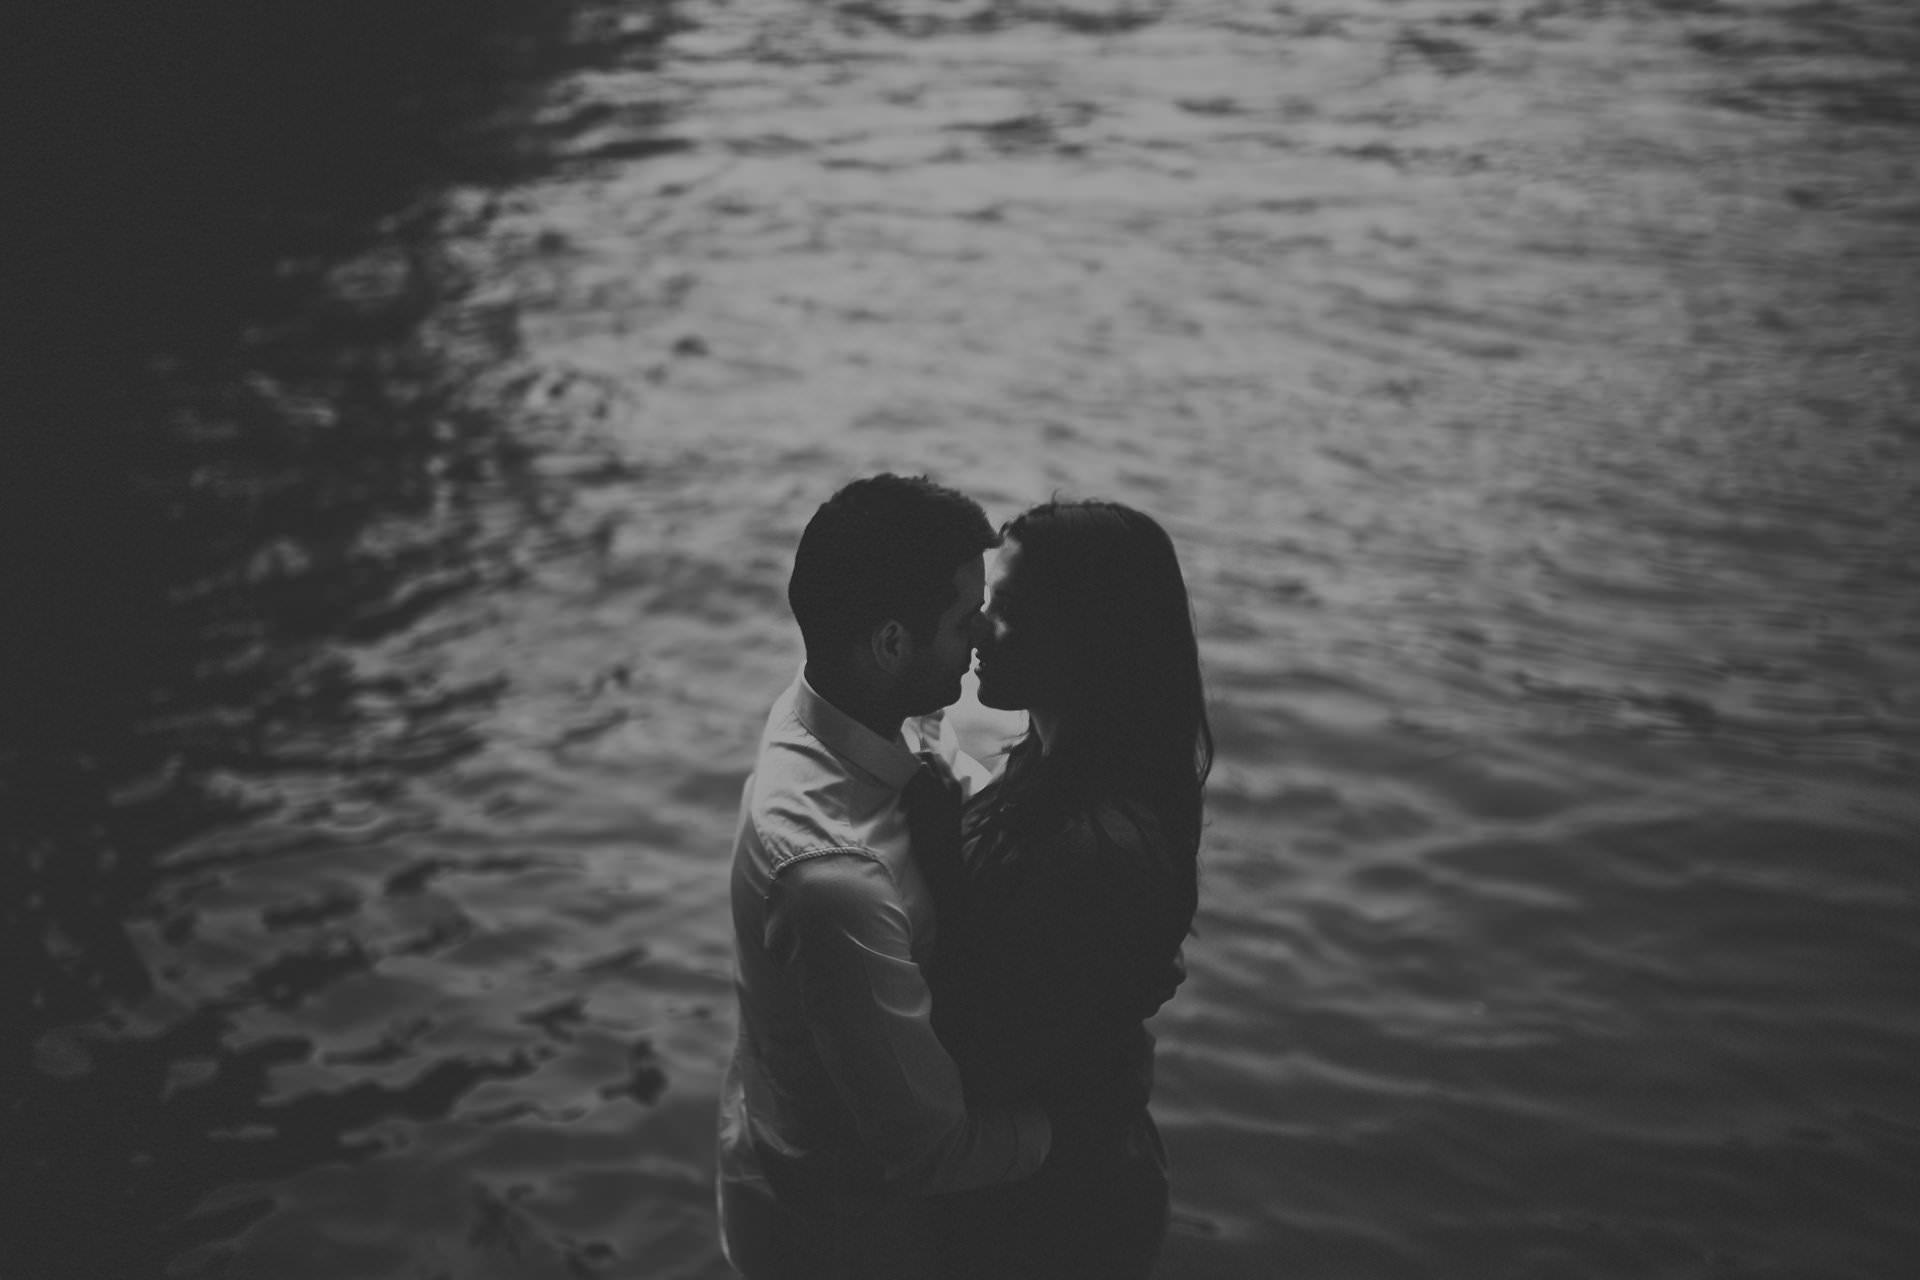 photographe professionnel bordeaux Dordgone mariage wedding photographer italy italian funny beautiful steven bassilieaux love session19.jpg